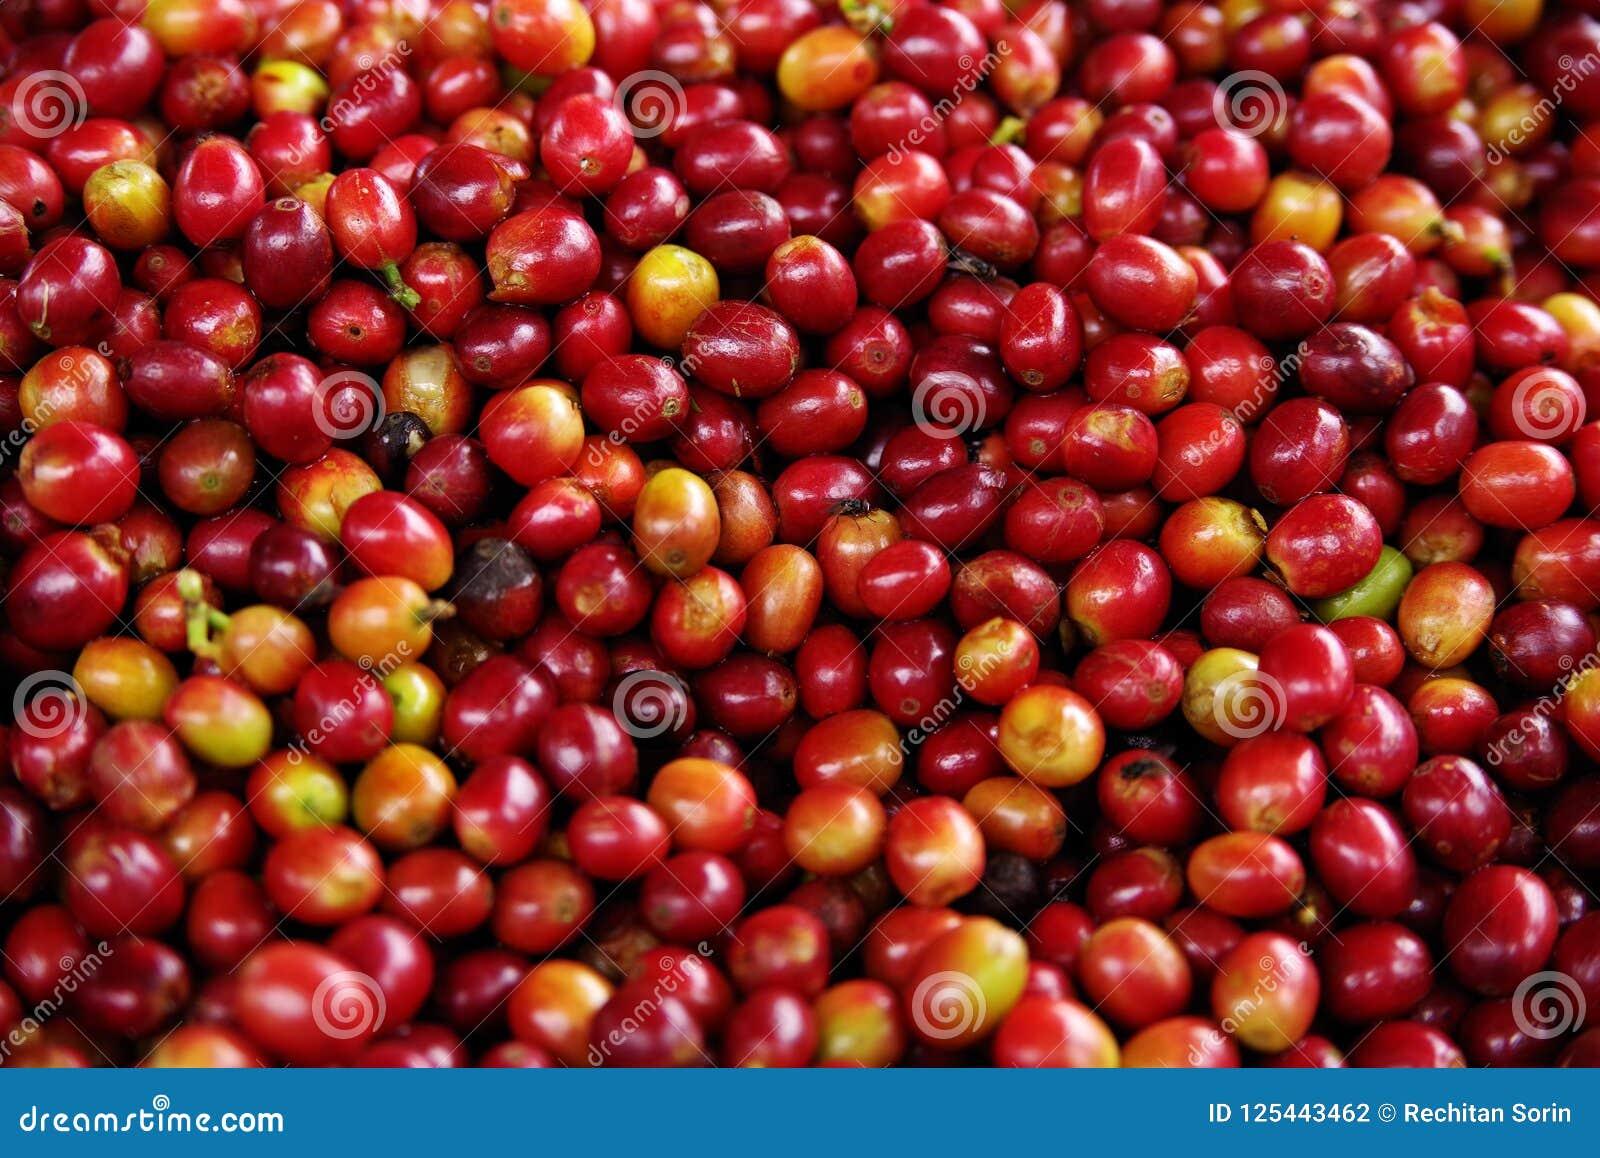 Ripe fruits of the coffe tree. Coffee plantations in Quindio - Buenavista, Colombia